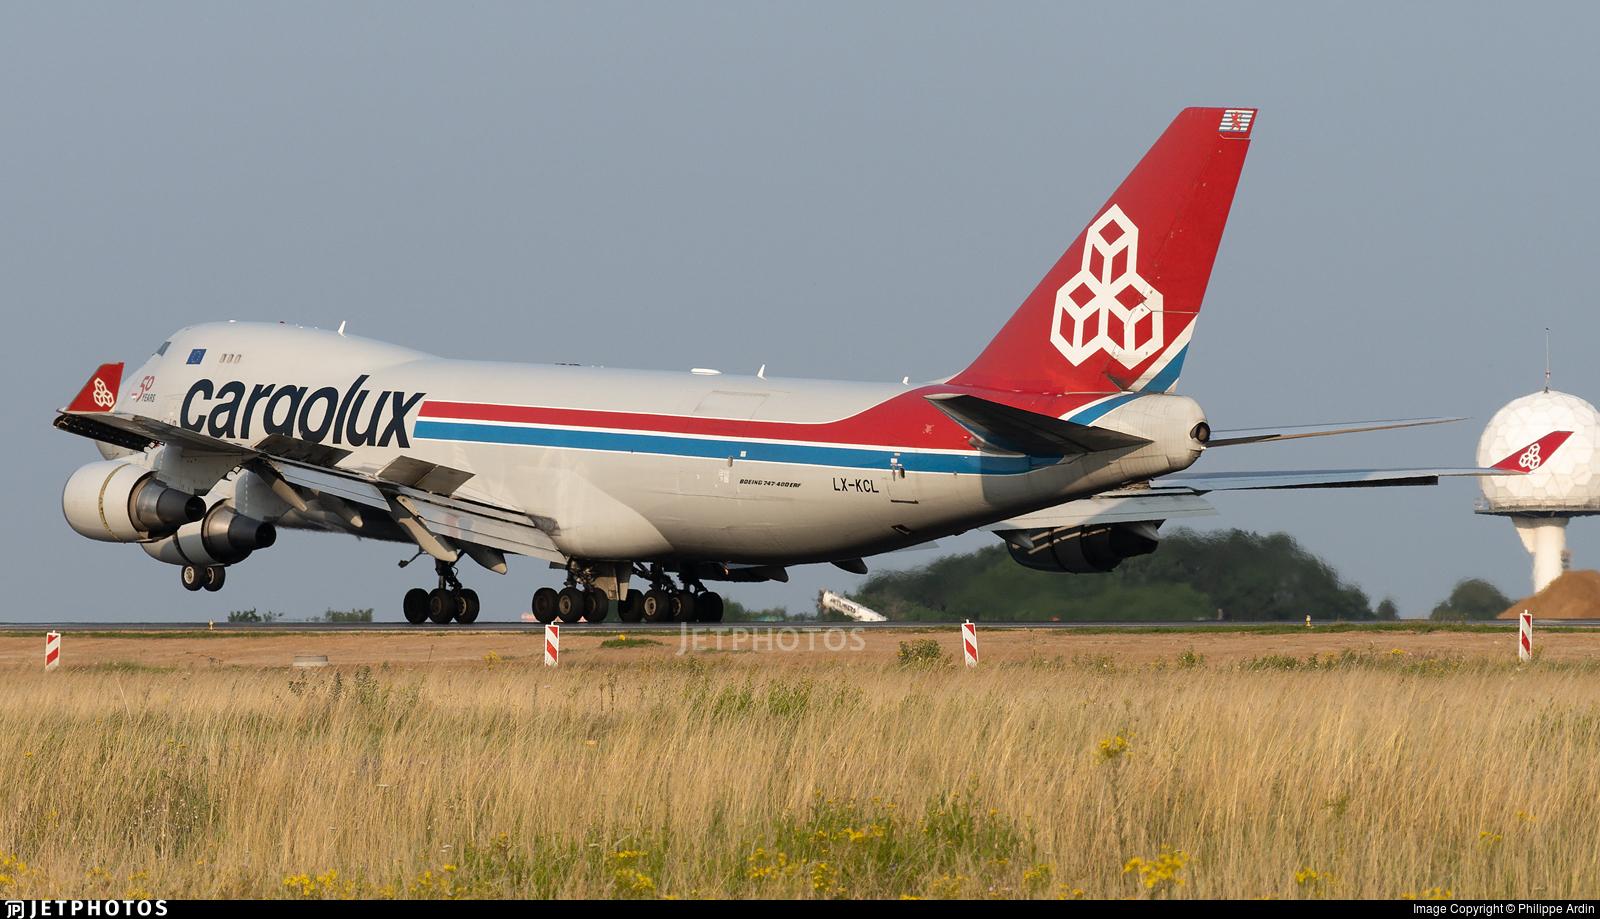 LX-KCL - Boeing 747-4HAERF - Cargolux Airlines International